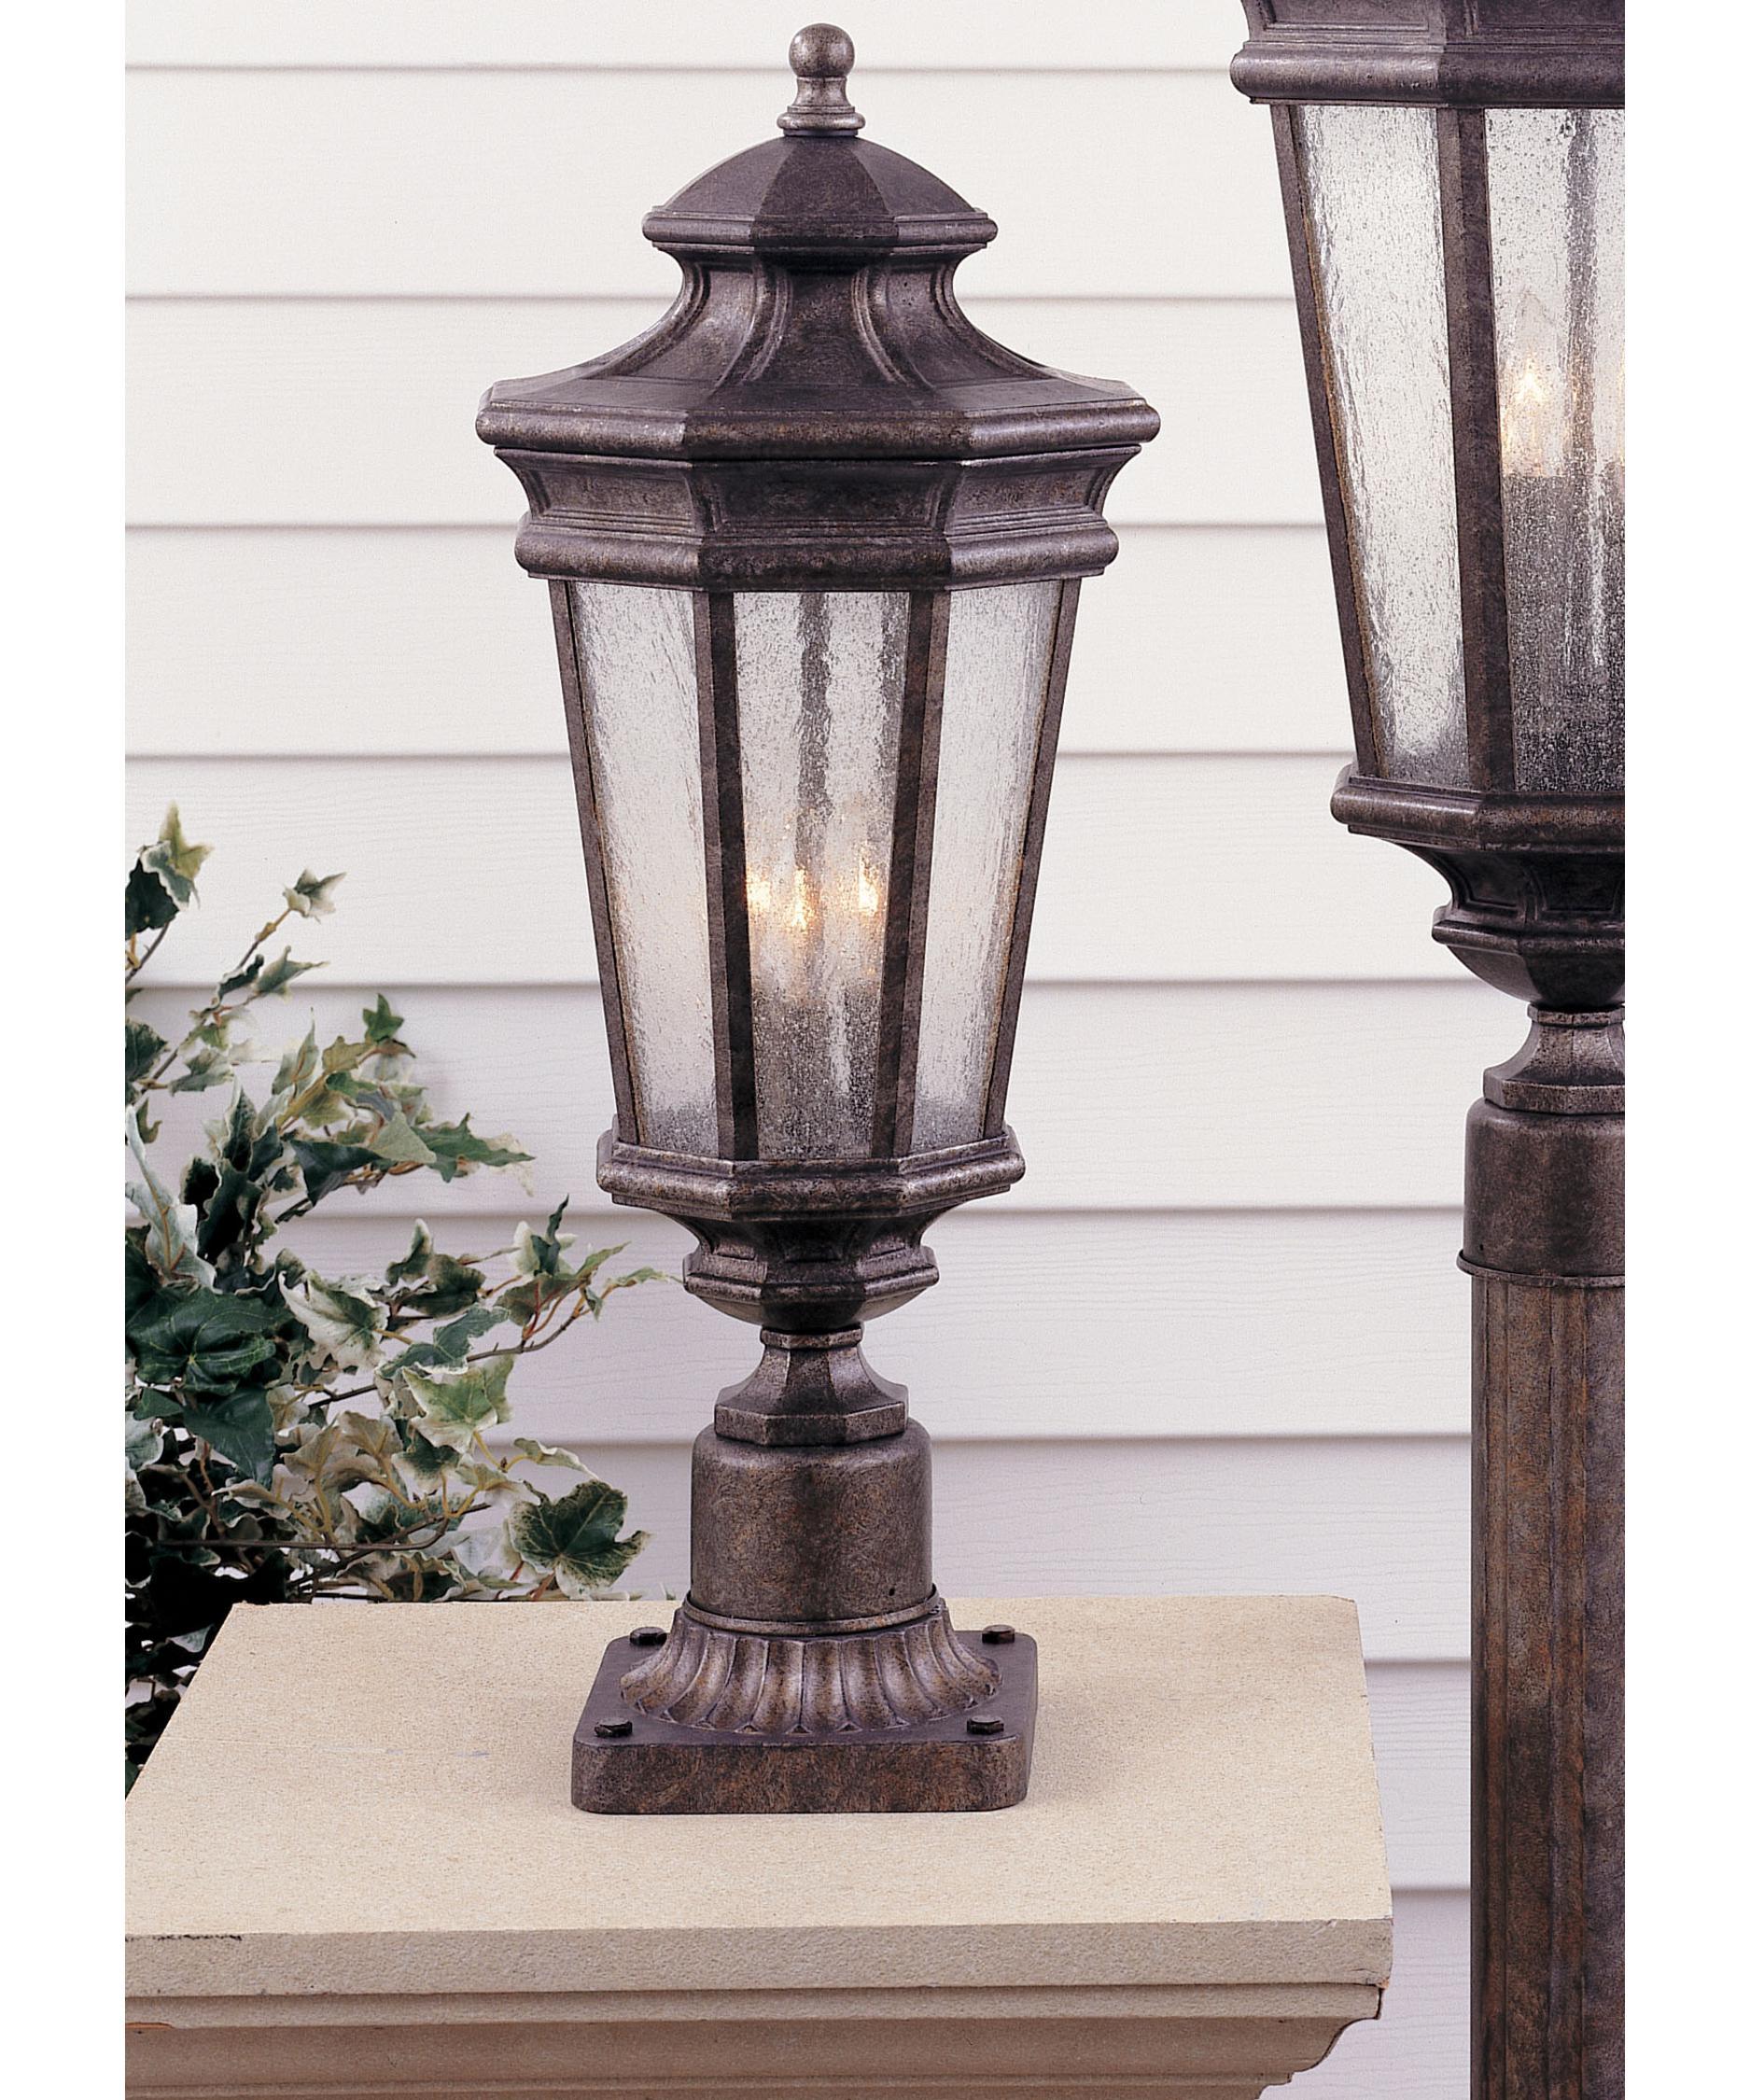 Murray Feiss Outdoor Lighting: Murray Feiss OL2907 Castille 3 Light Outdoor Post Lamp